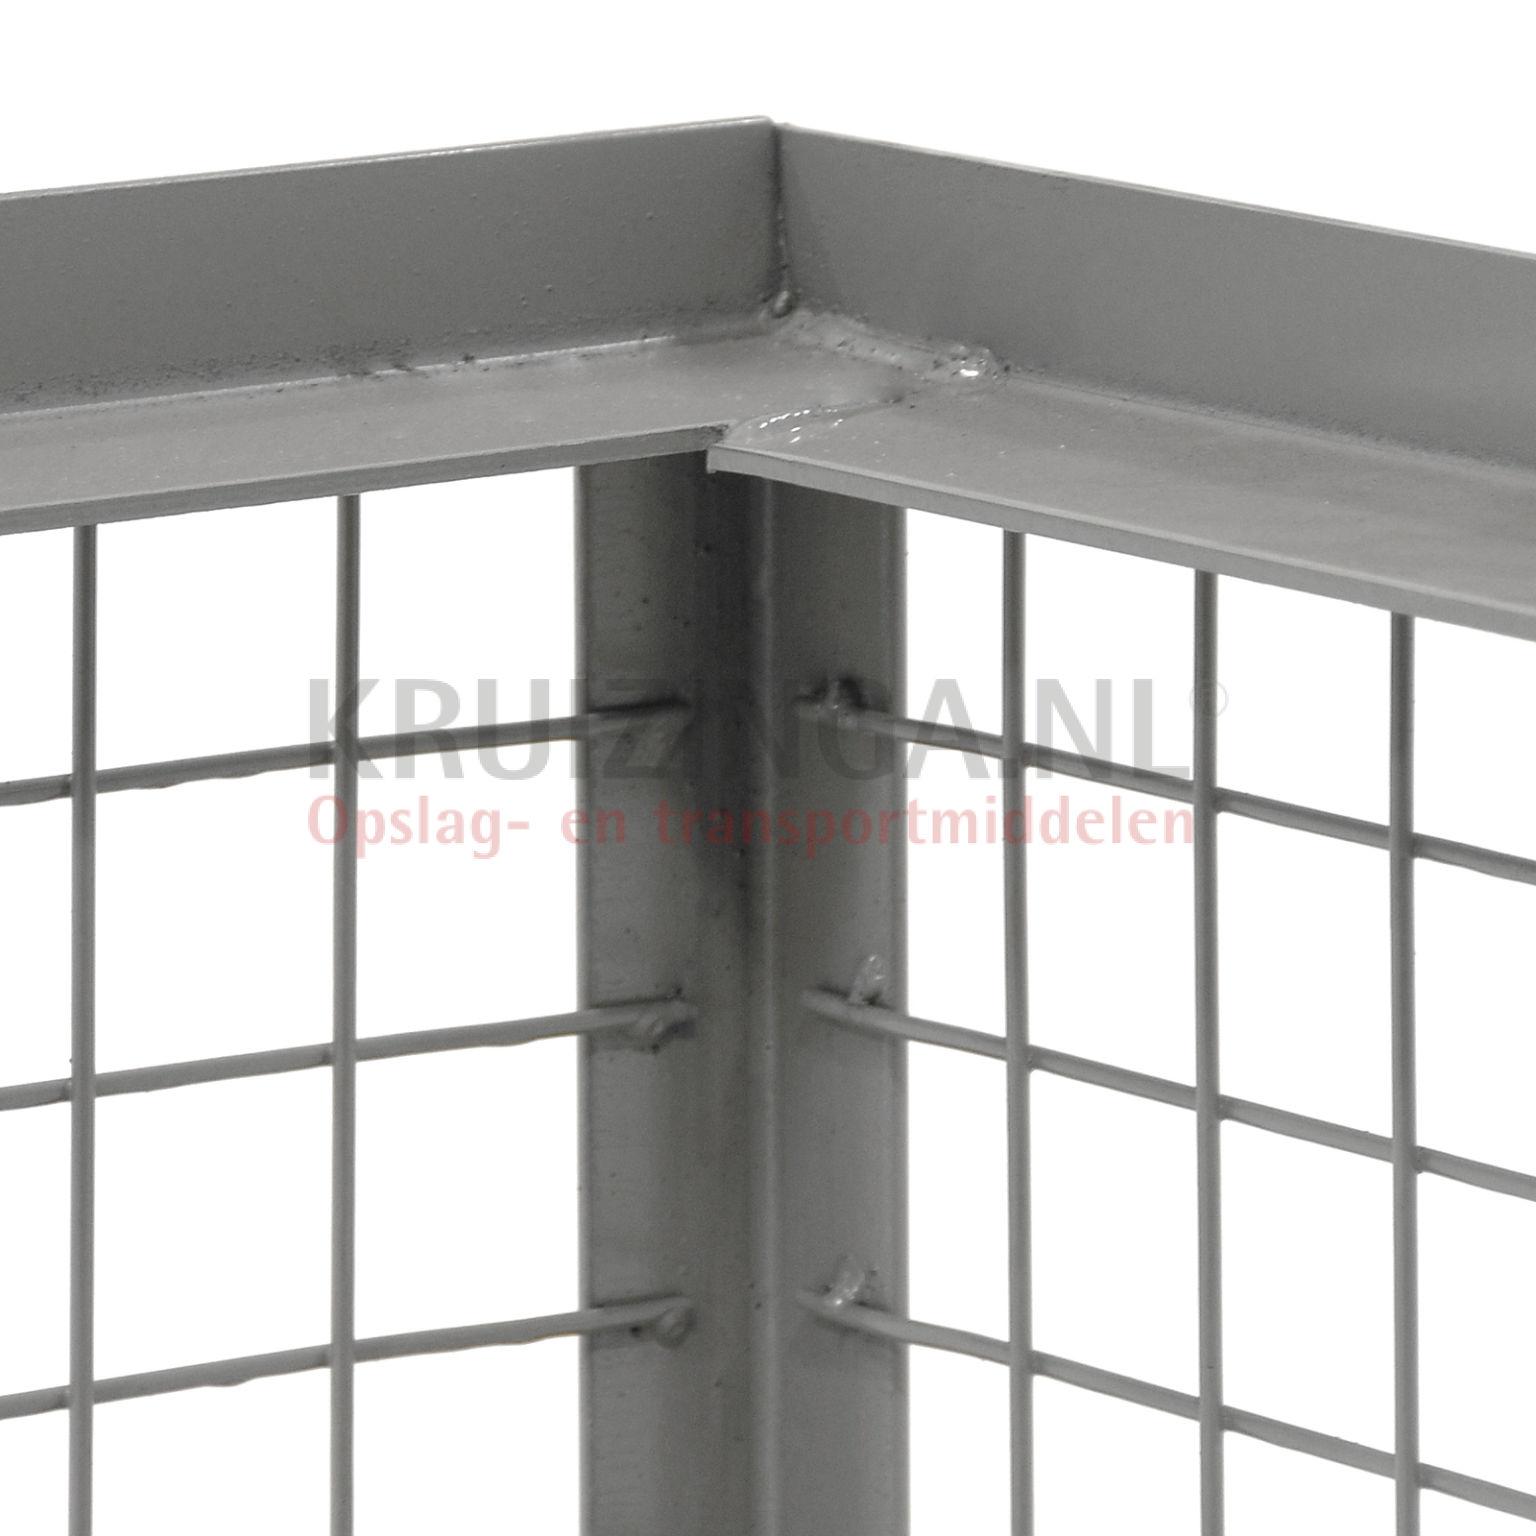 gitterbox feste konstruktion 1 lange wand ist klappbar ab 101 50 frei haus. Black Bedroom Furniture Sets. Home Design Ideas